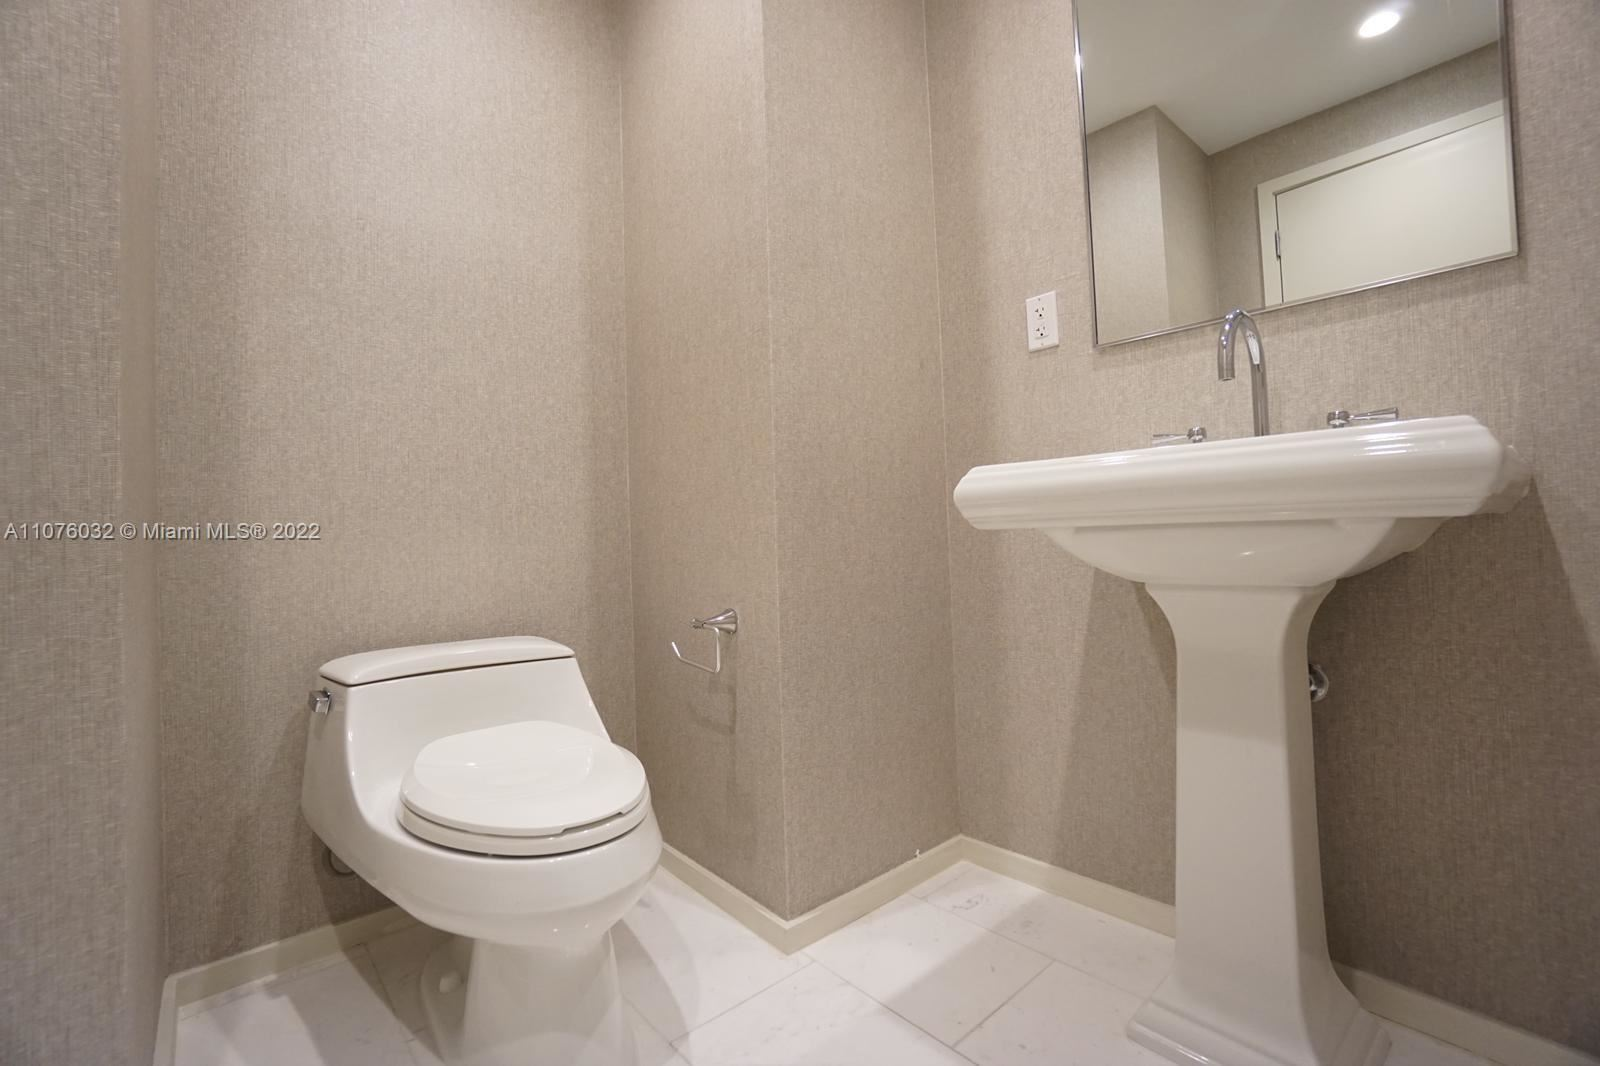 Photo of 551 N Fort Lauderdale Beach Blvd #R2301, Fort Lauderdale, FL 33304 (MLS # A11076032)